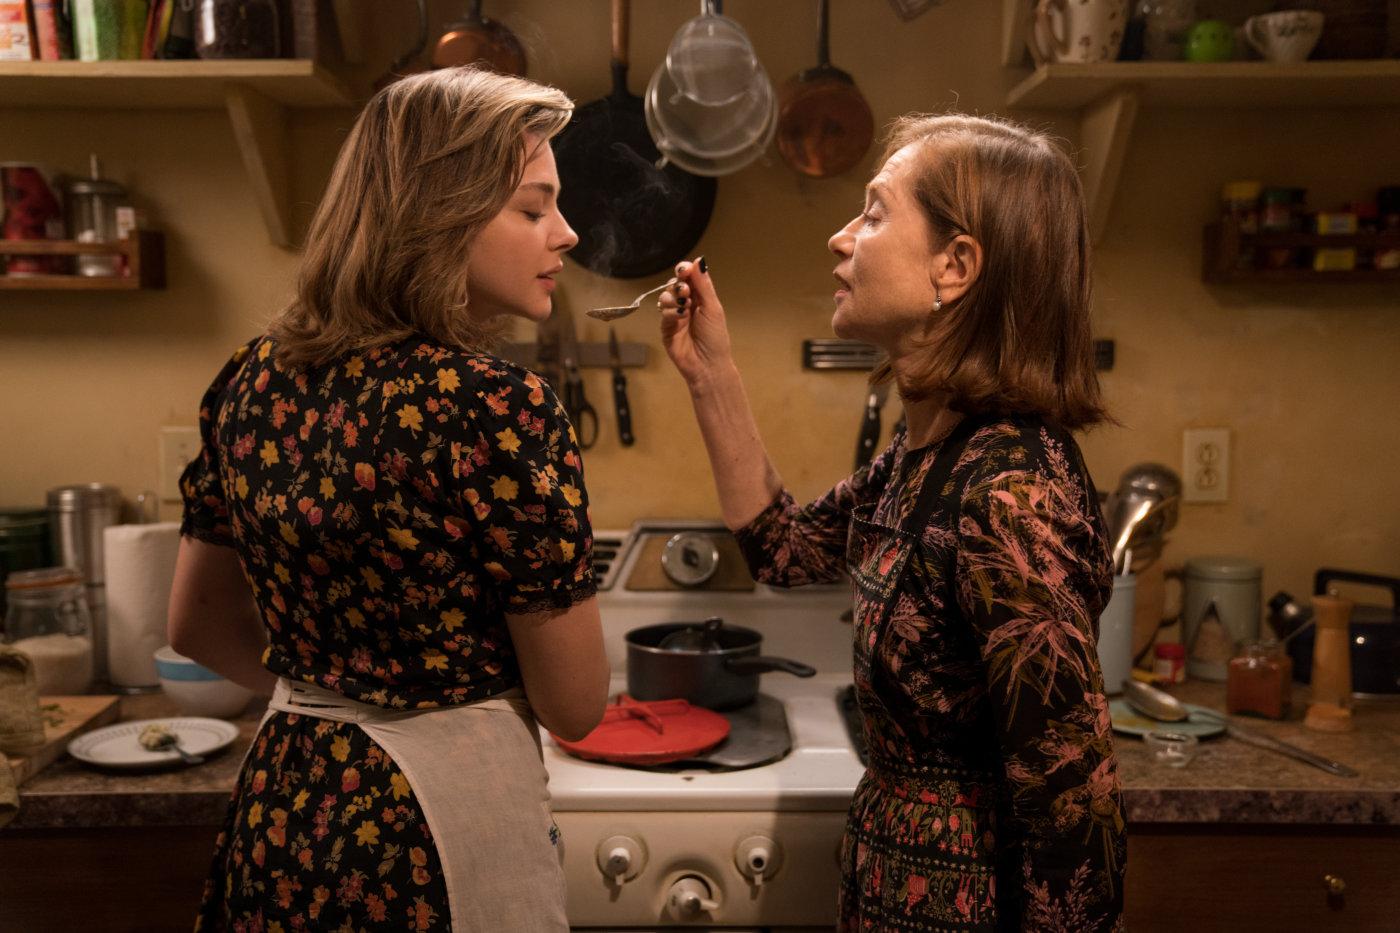 Movie Review: Greta